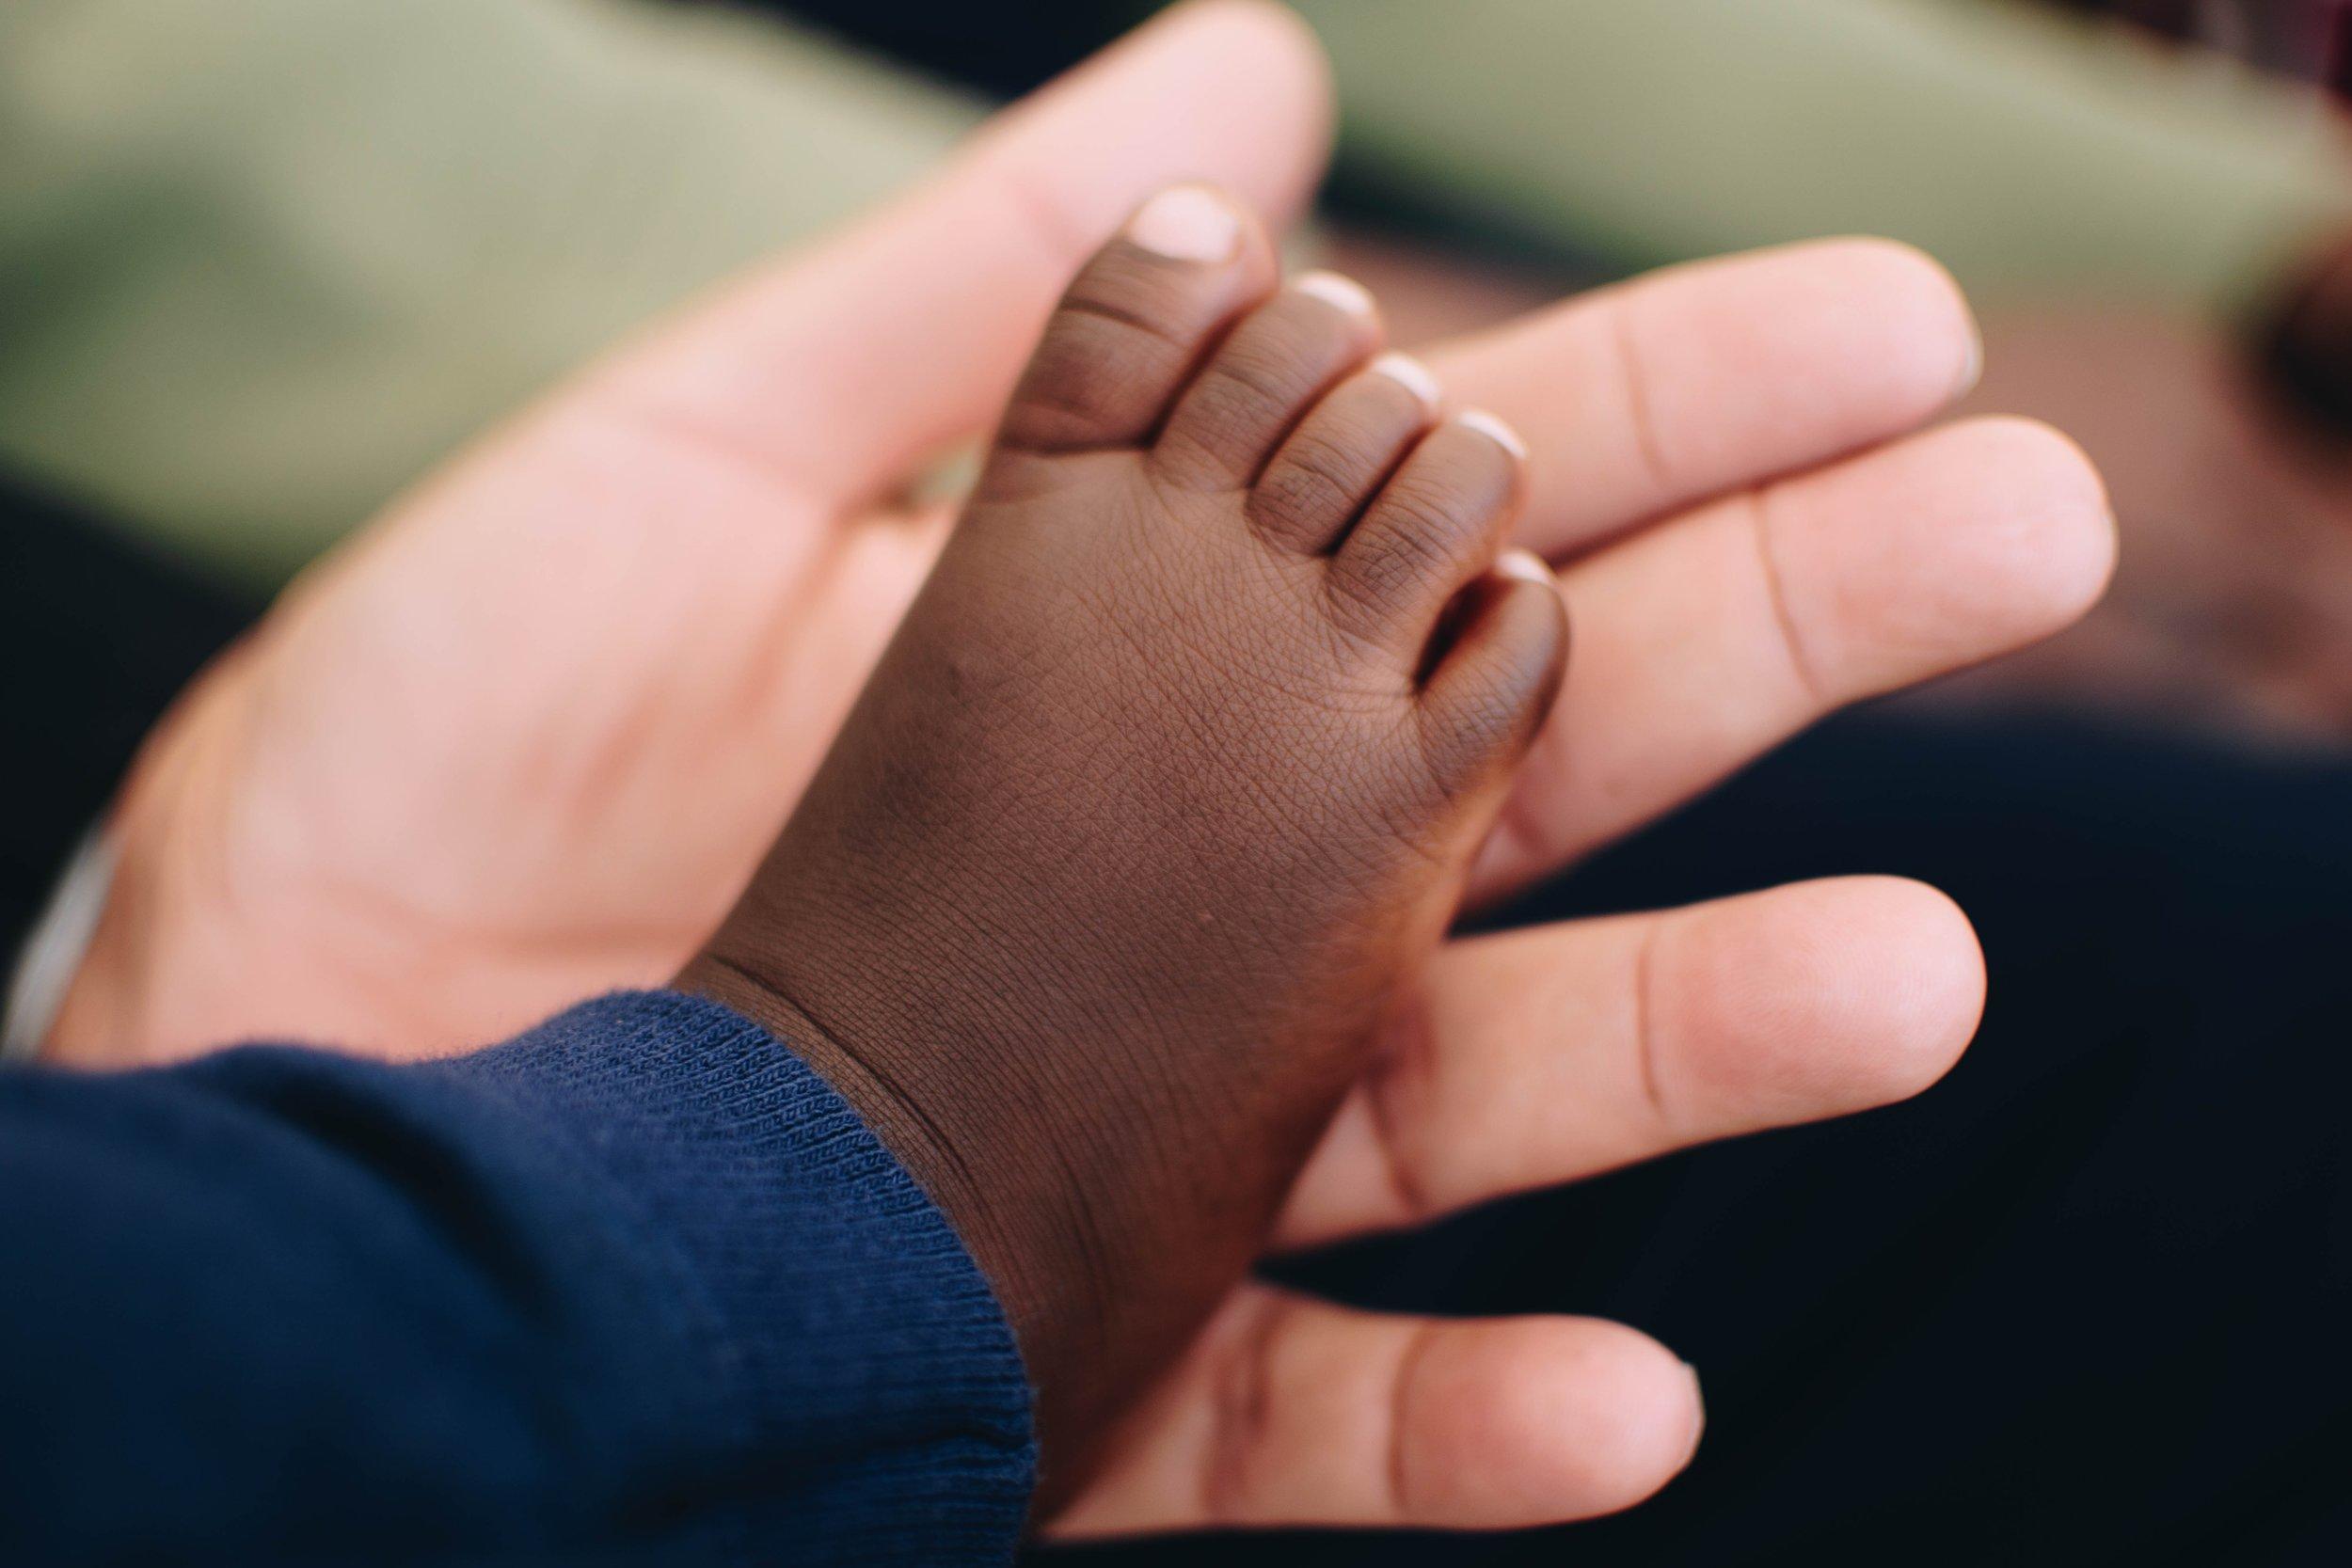 adult-baby-baby-feet-1170836.jpg